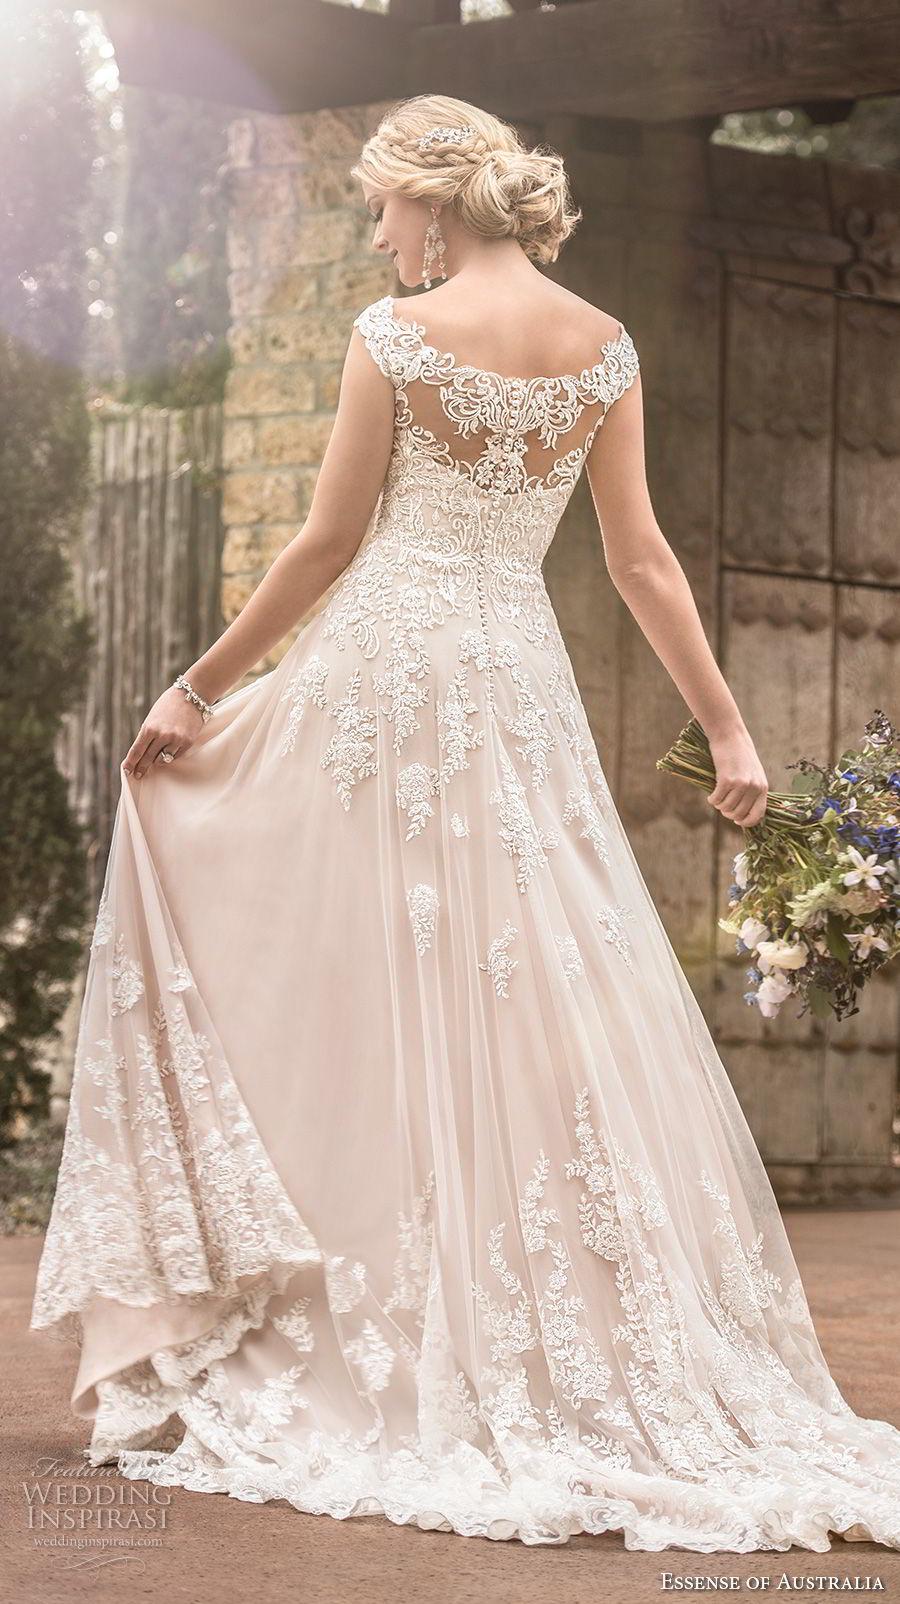 Trubridal Wedding Blog  Essense of Australia Fall 2017 Wedding Dresses  Trubridal Wedding Blog